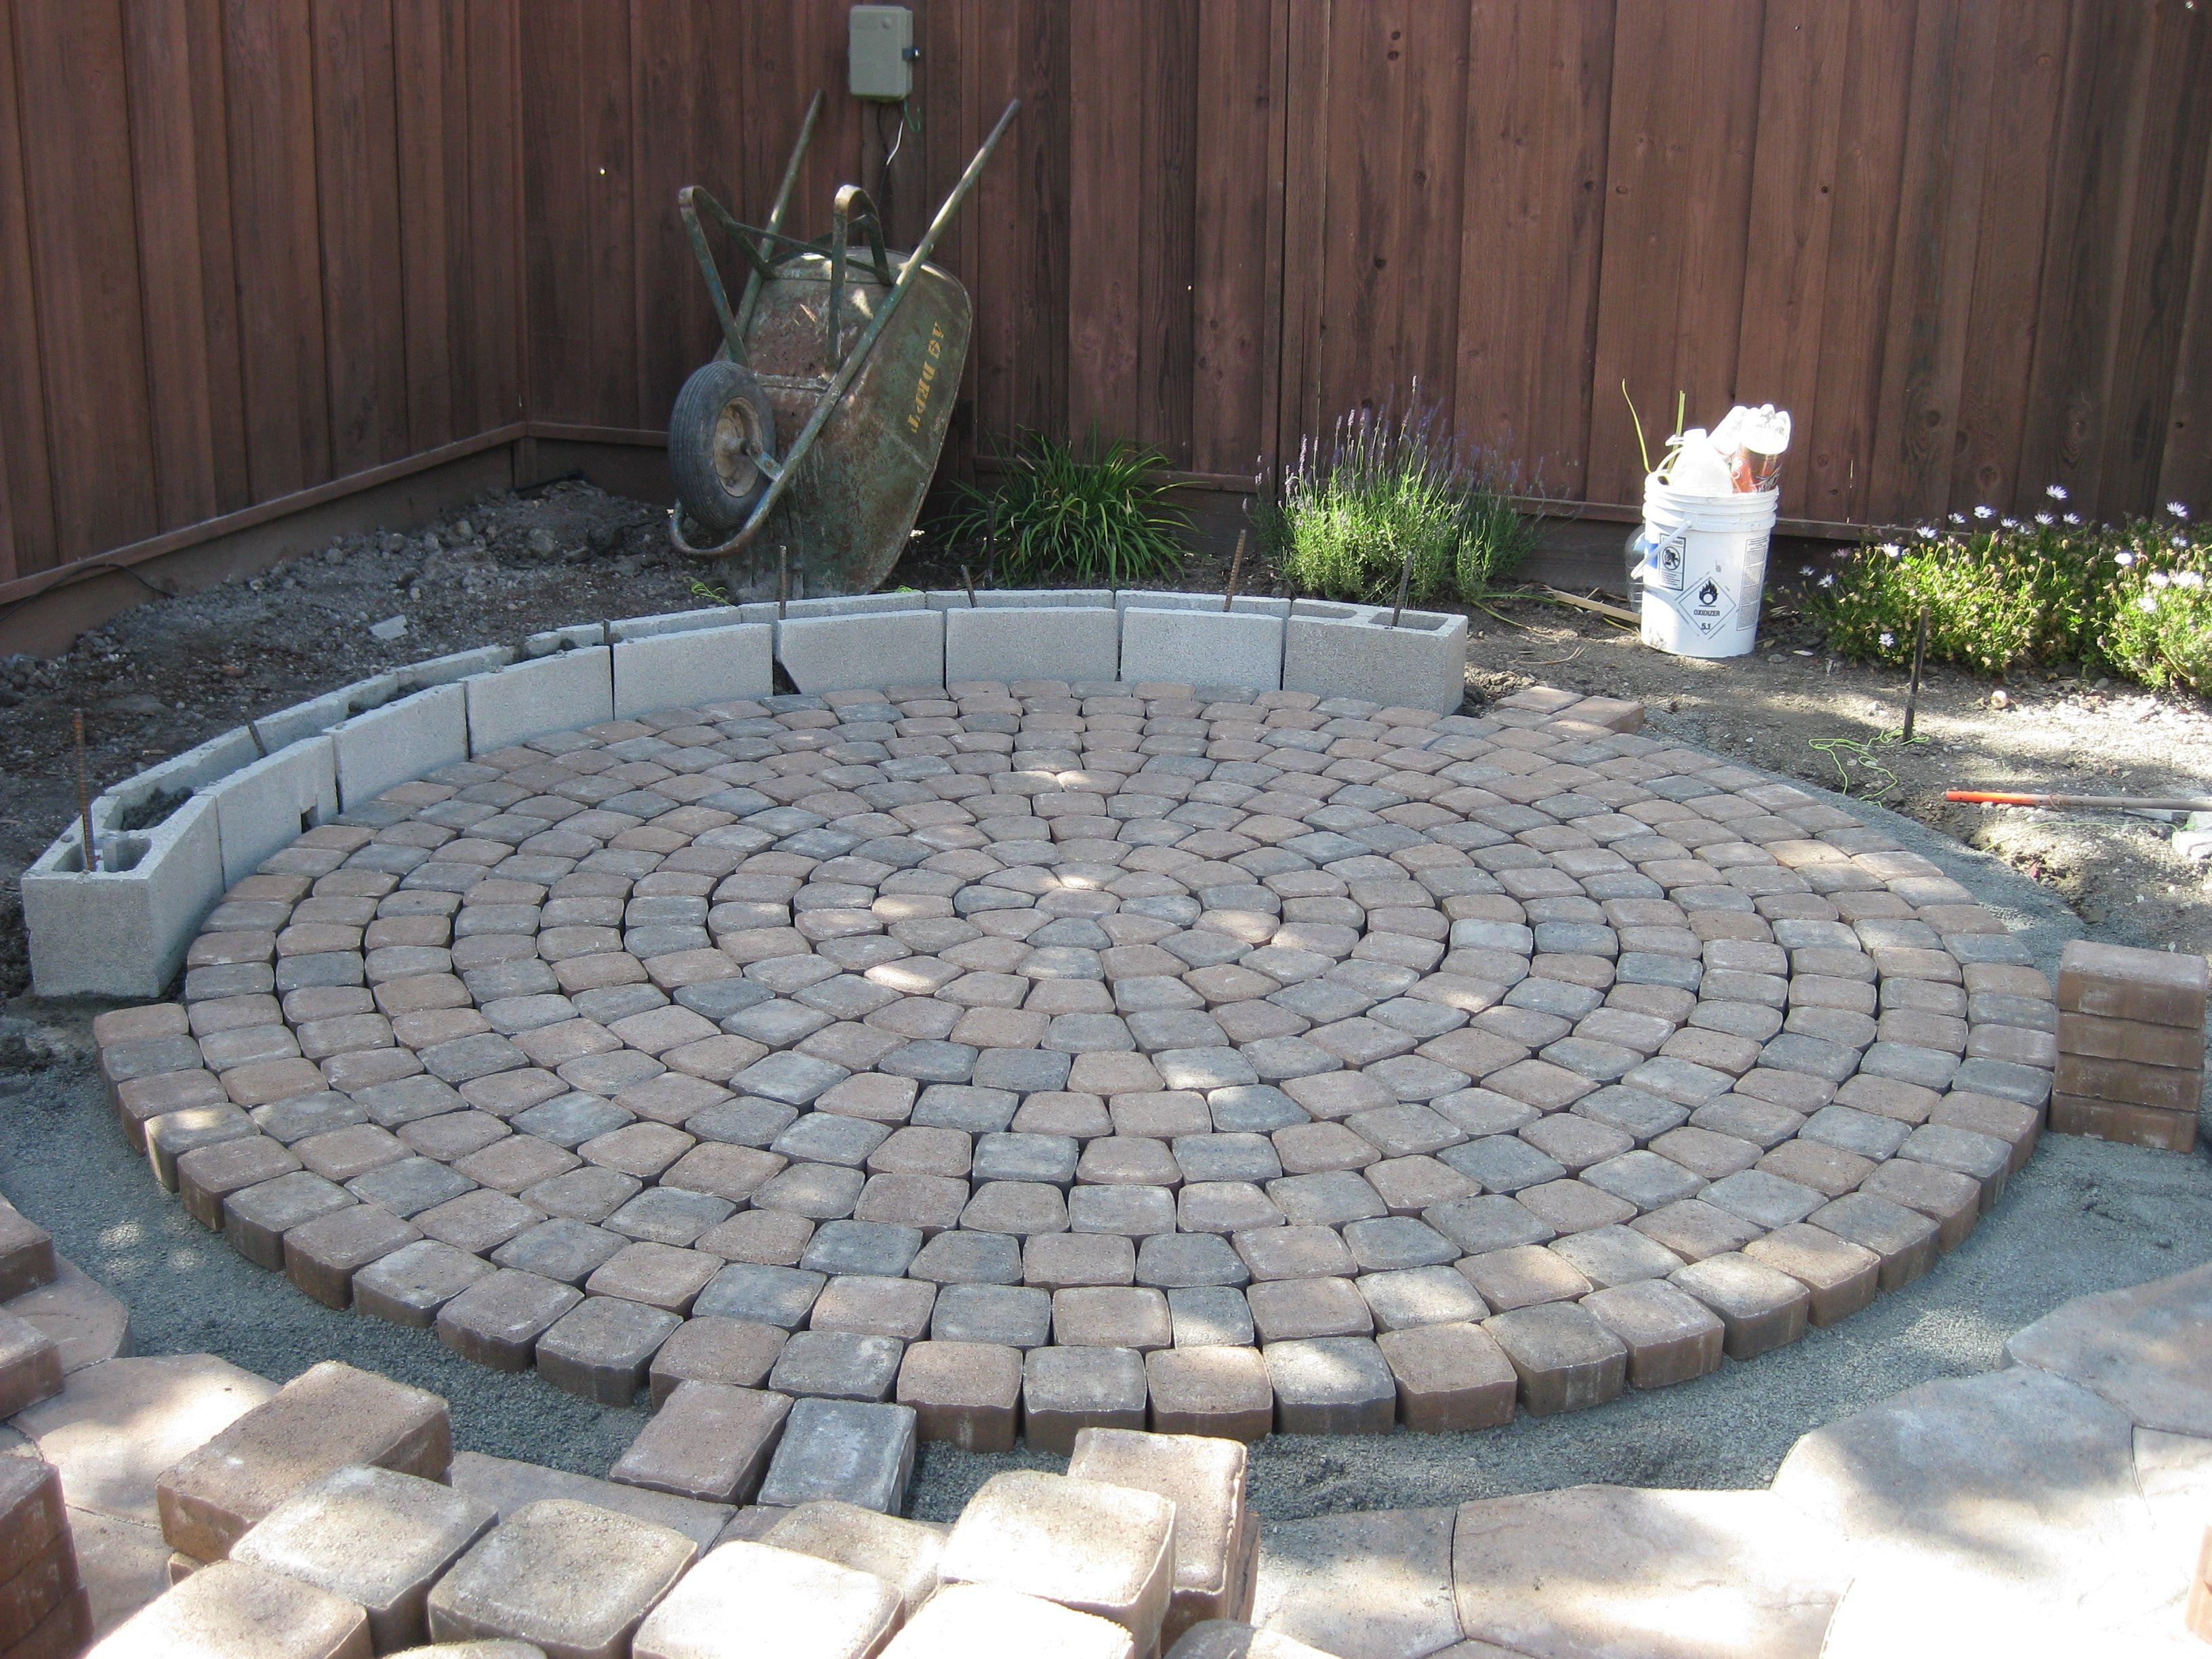 Fullsize Of Round Stepping Stones